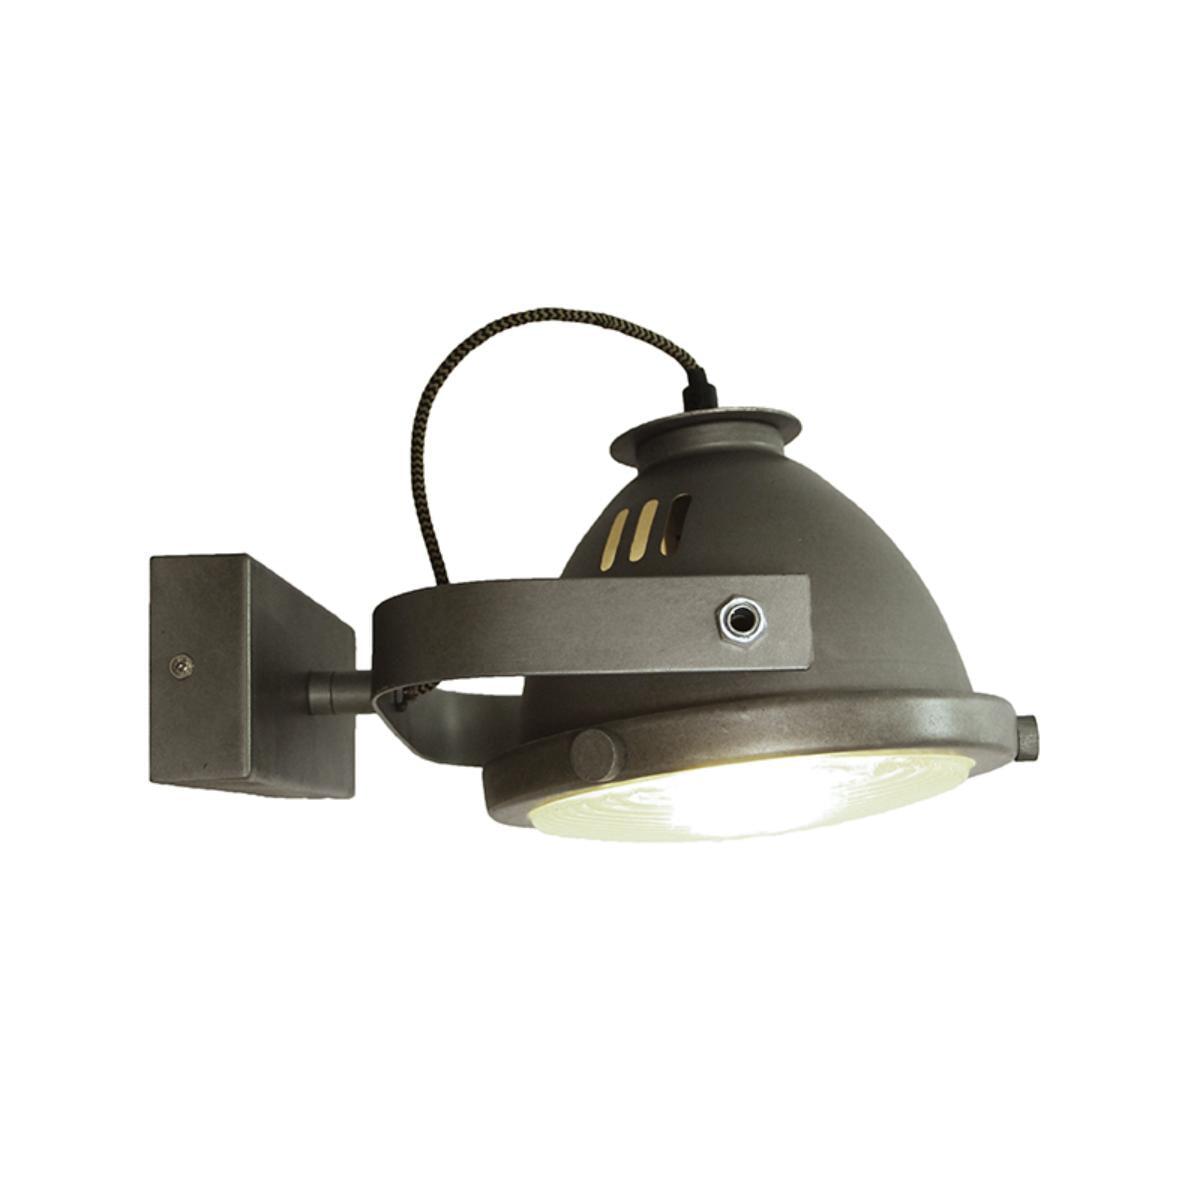 LABEL51 wandlamp 'Tuk-tuk'